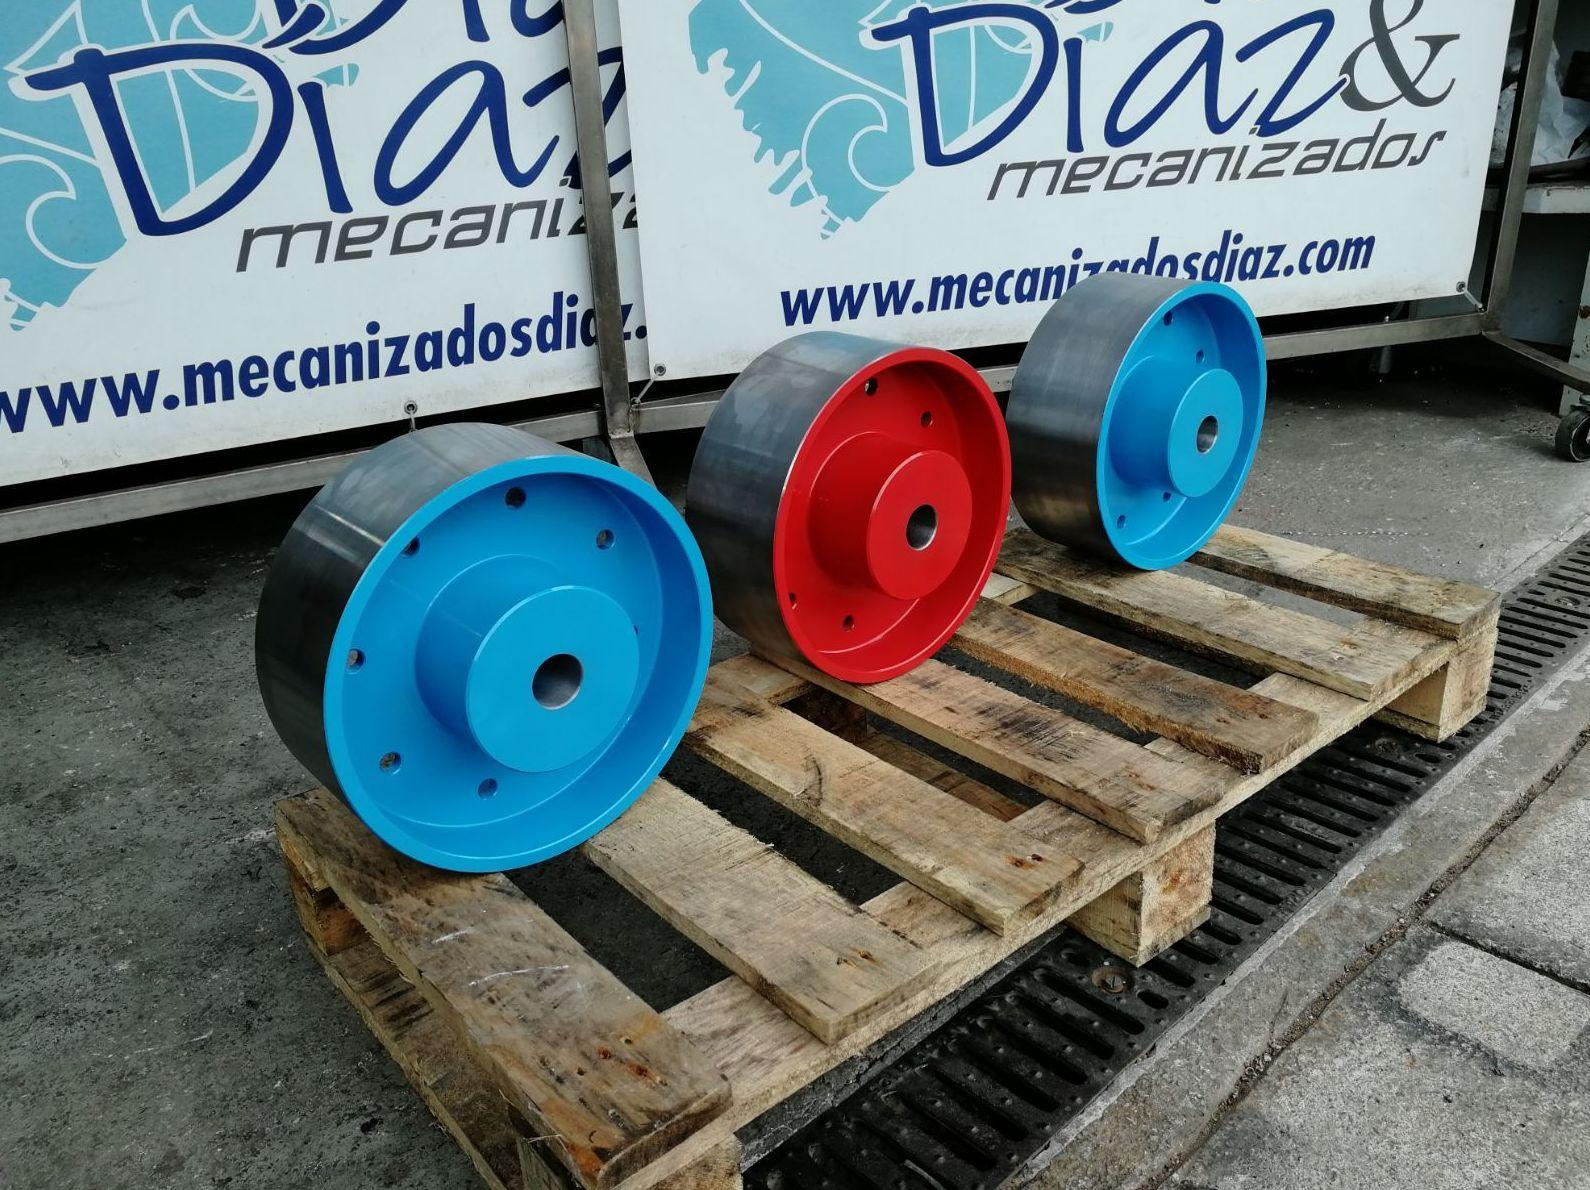 Mecanizados industriales en Gijón, Díaz & Diaz